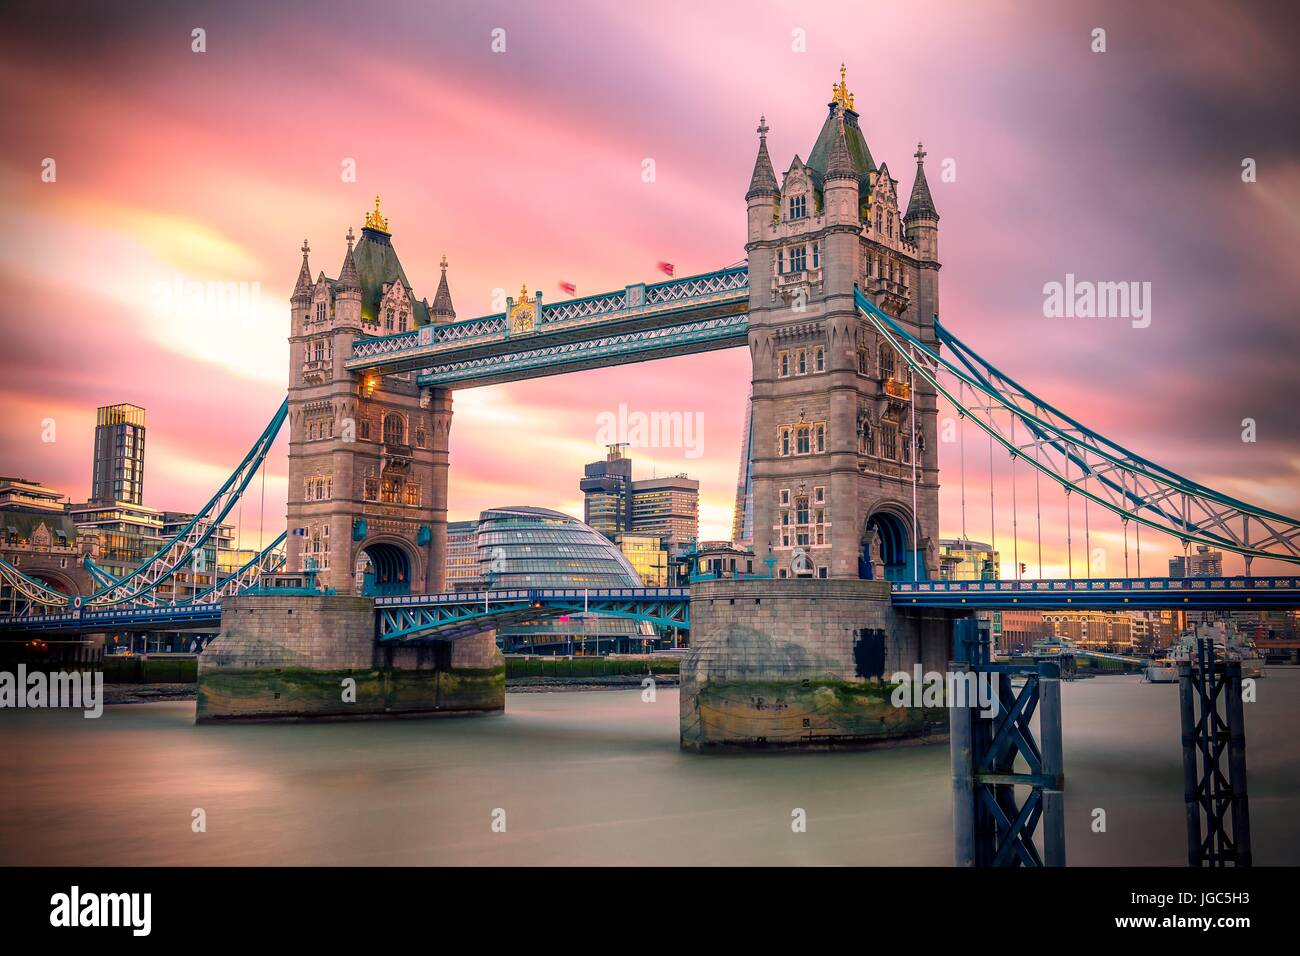 Tower bridge (London city) at sunset - Stock Image